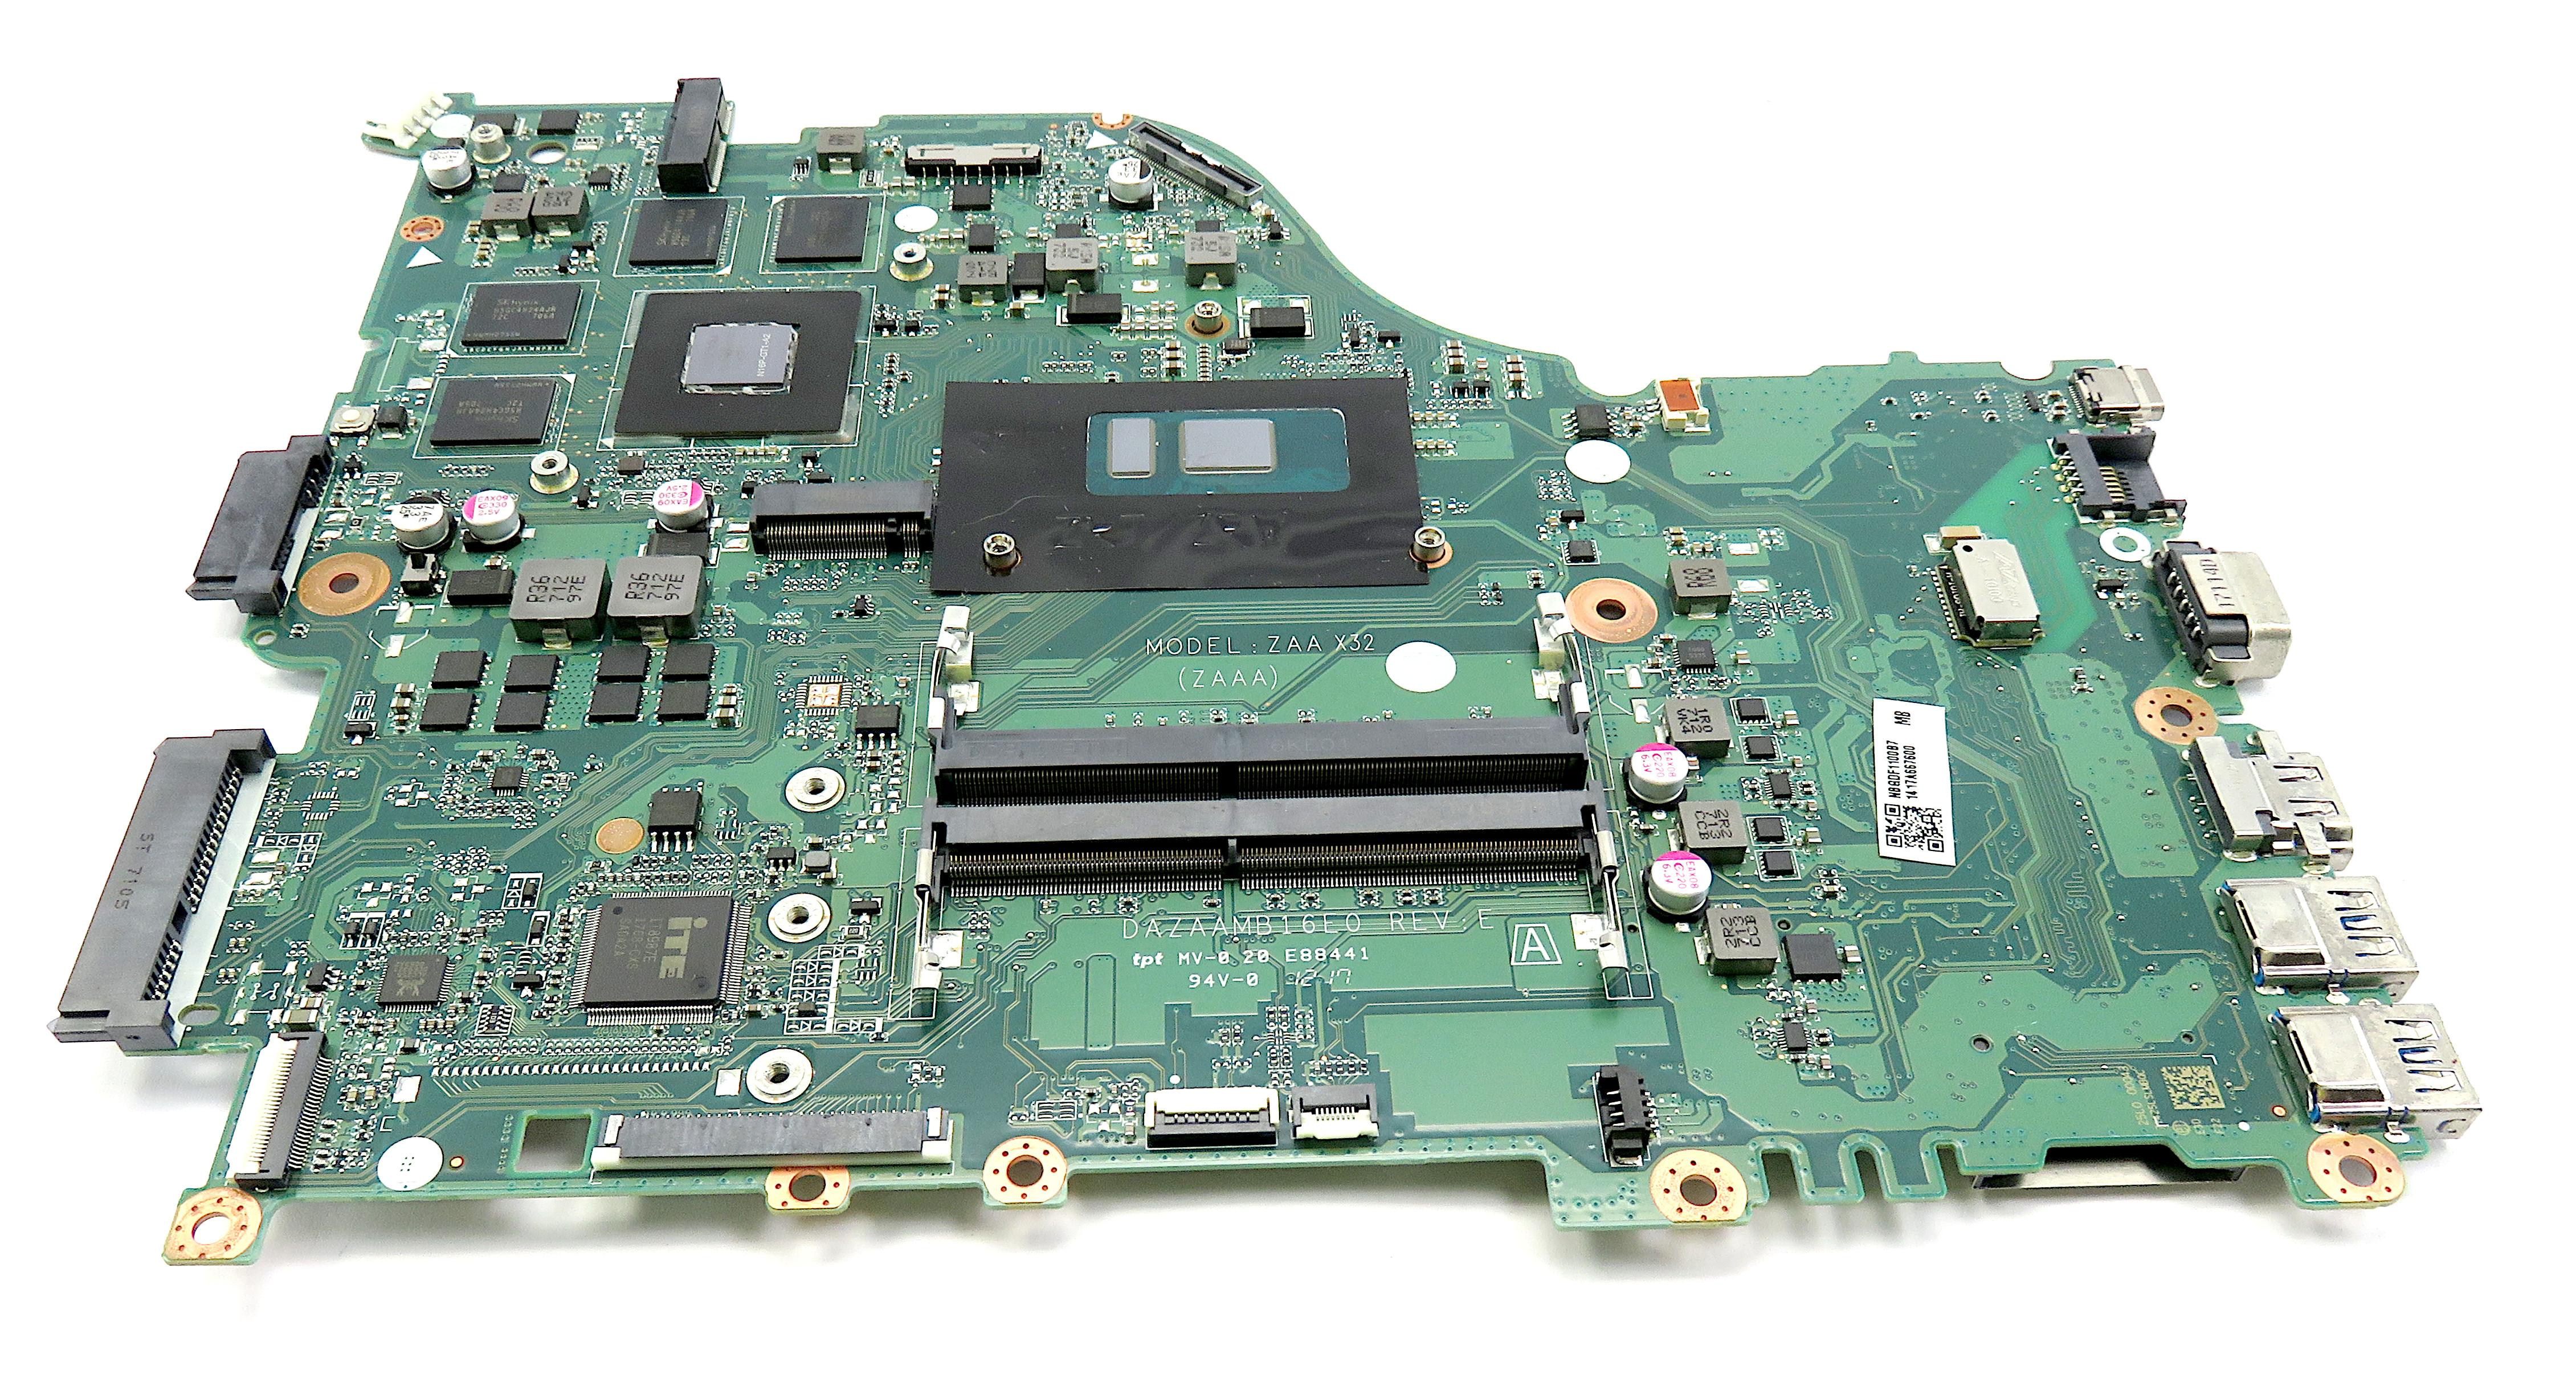 Acer Aspire E5-575 E5-575G - CPU I5-7200U Dis 950M 2GB Motherboard - NBGDF1100B